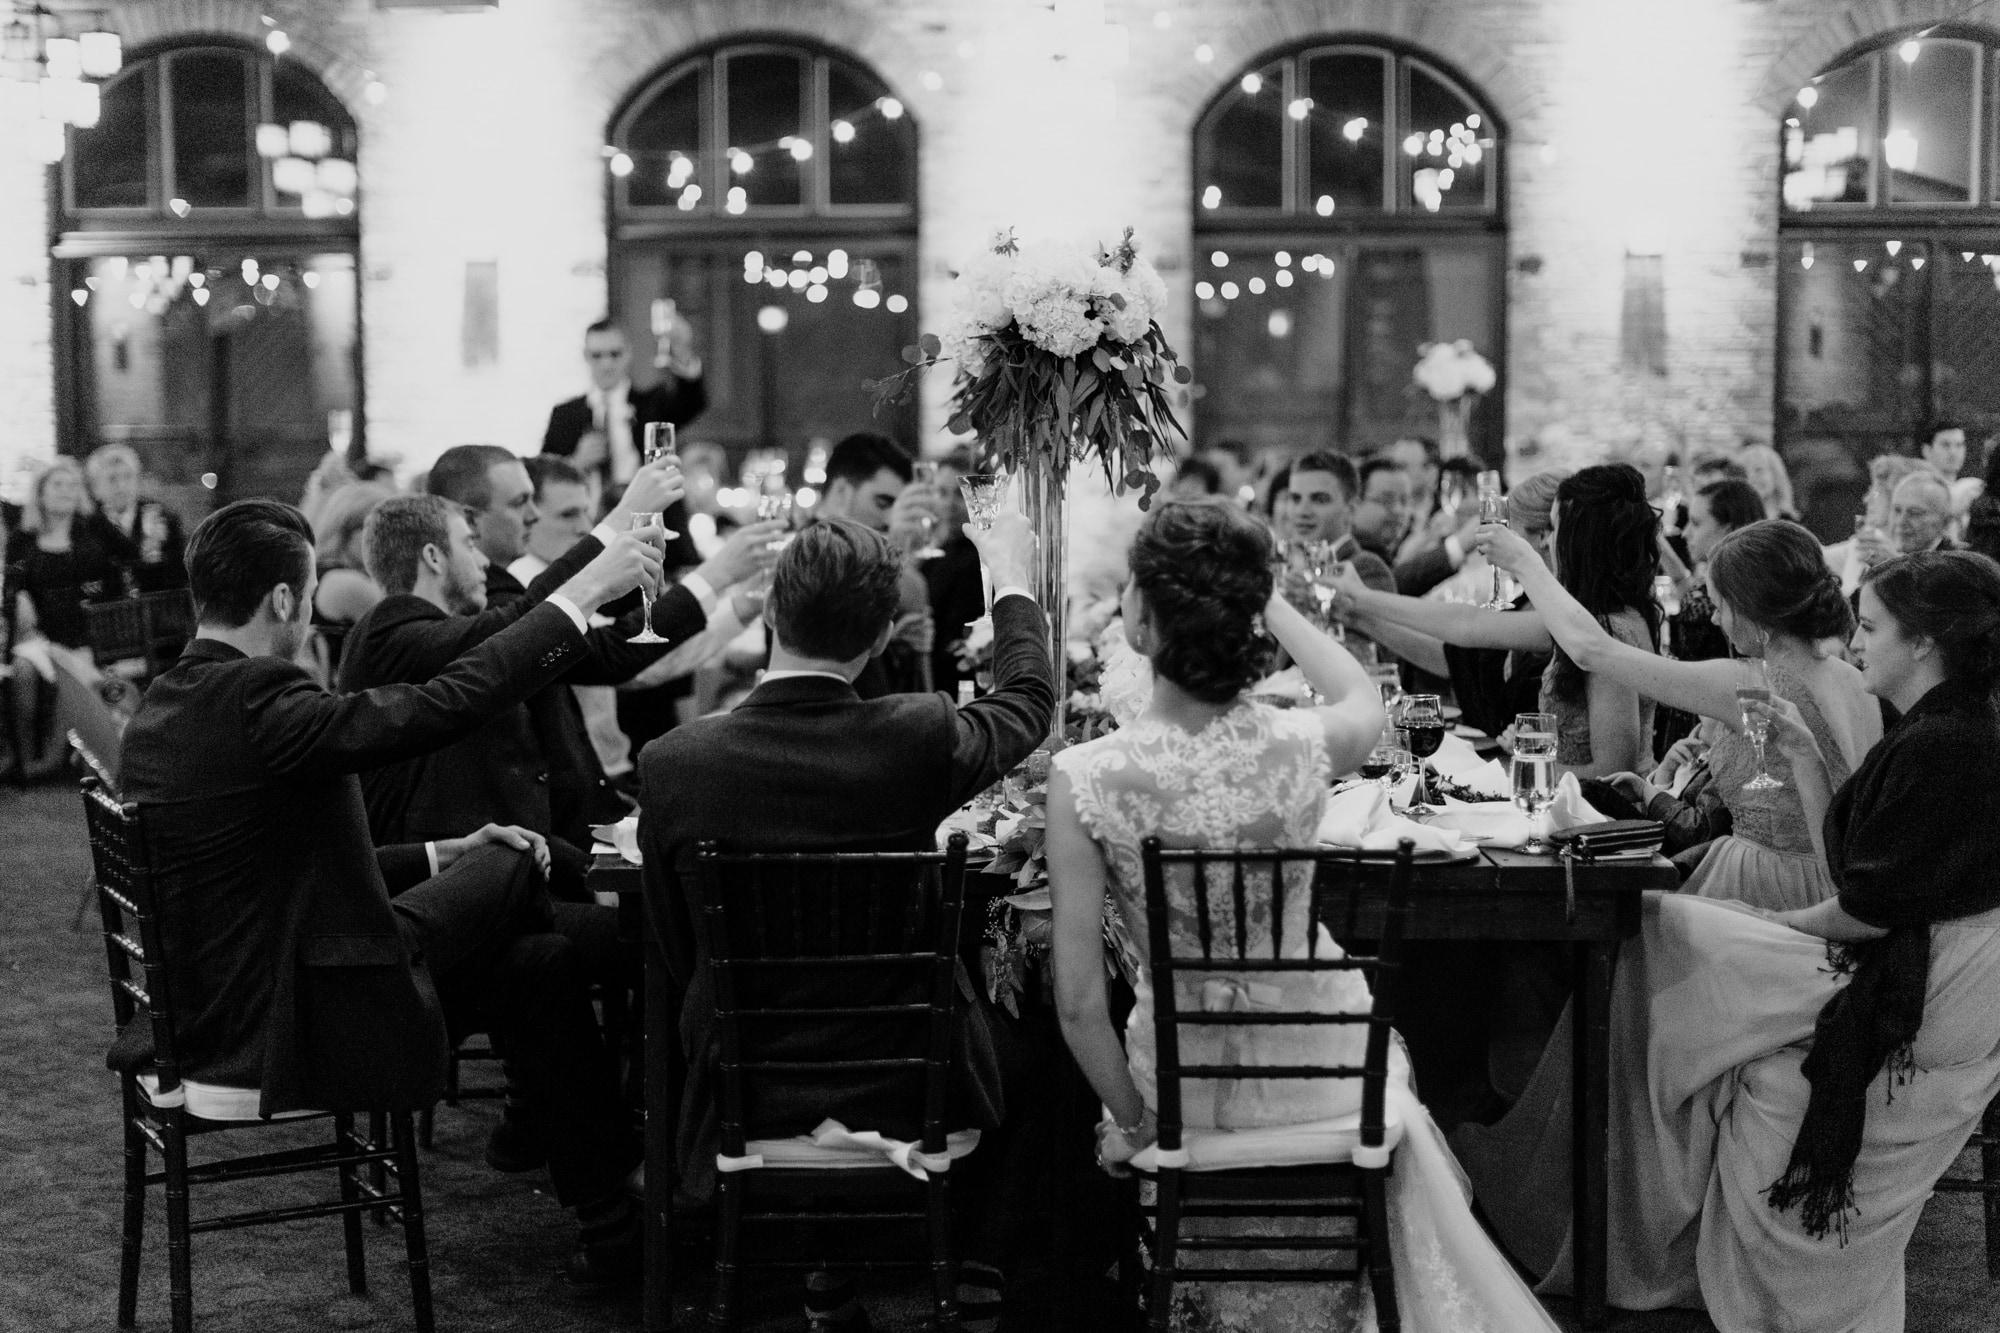 Nicollet-Island-Pavilion-Winter-Wedding-Minneapolis_52.jpg